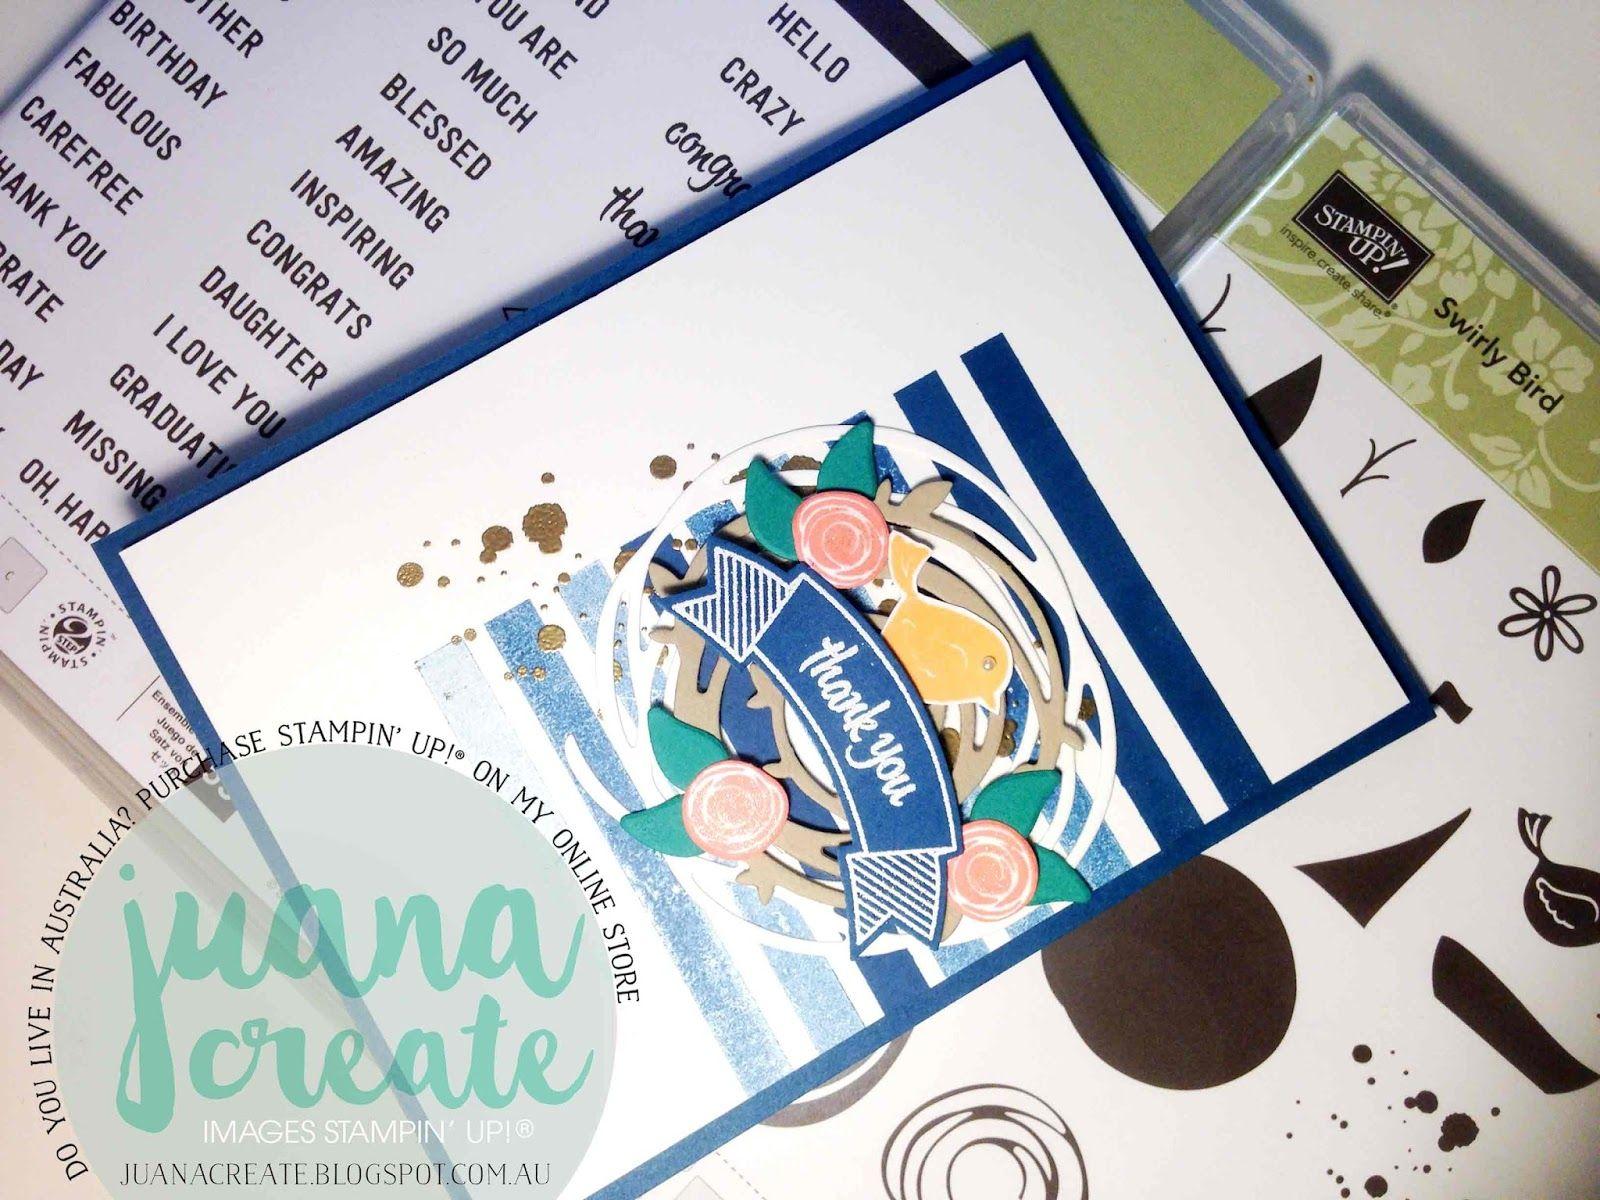 Juana Ambida | Thoughtful Swirly Bird | Kylie's International Blog Highlight - Thank You theme. Handmade card using new products in the new catalogue. #Stampinup, #Juanacreate